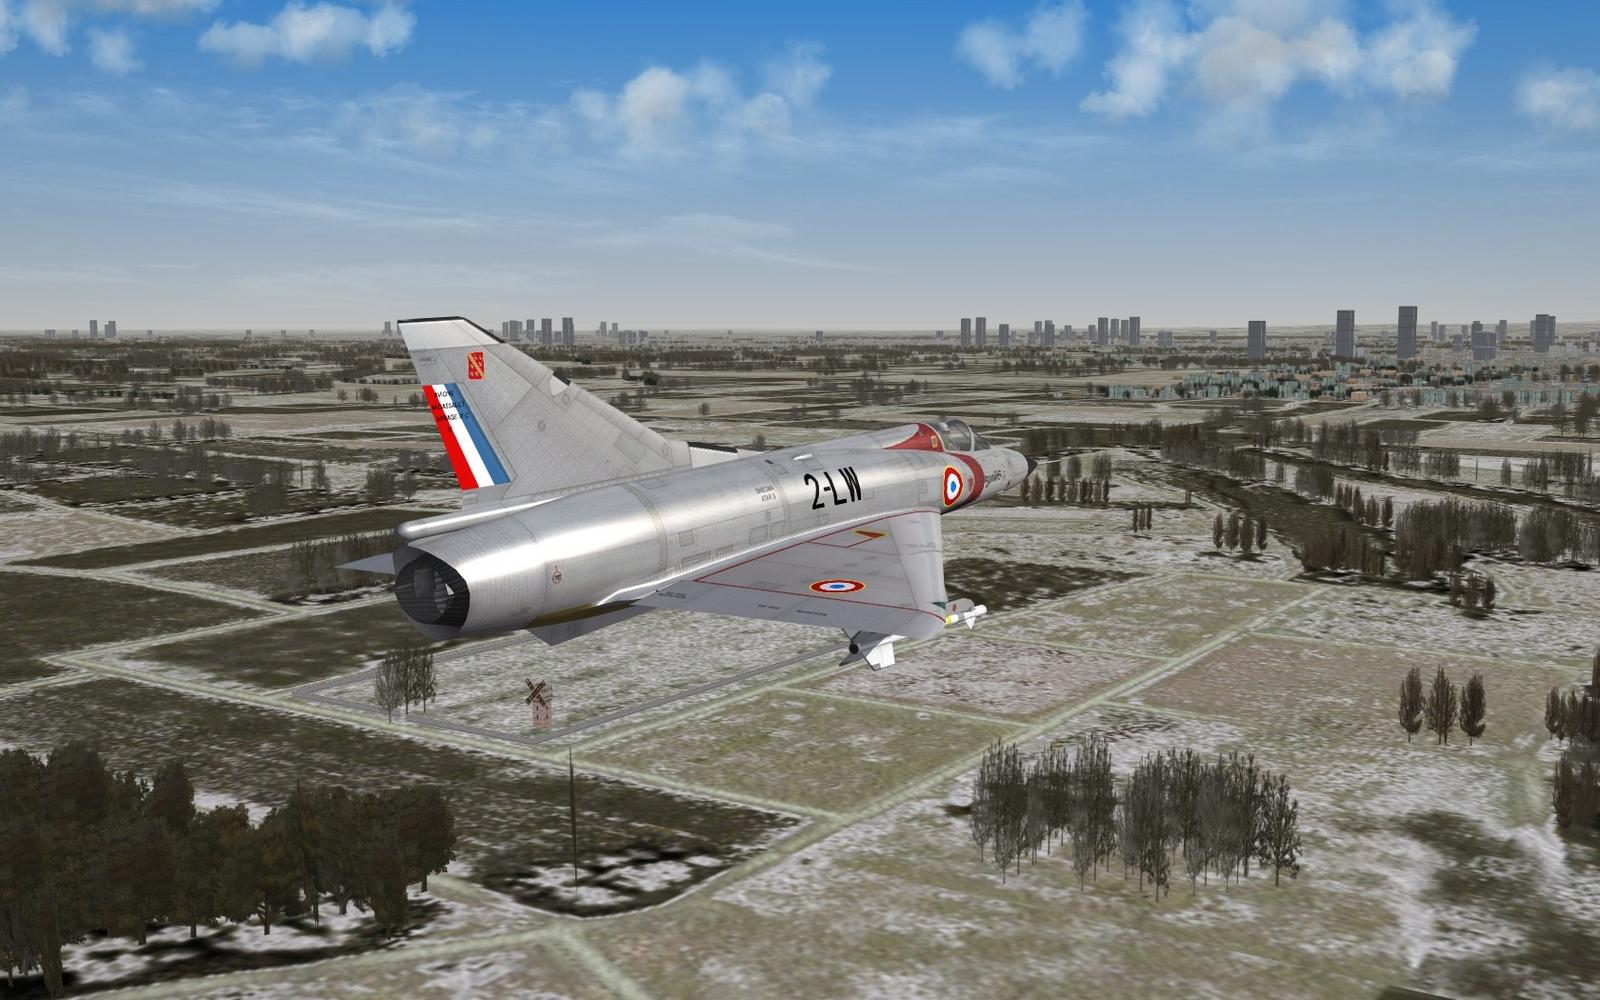 Mirage IIIC - EC 3/2 Alsace - ca. 1962